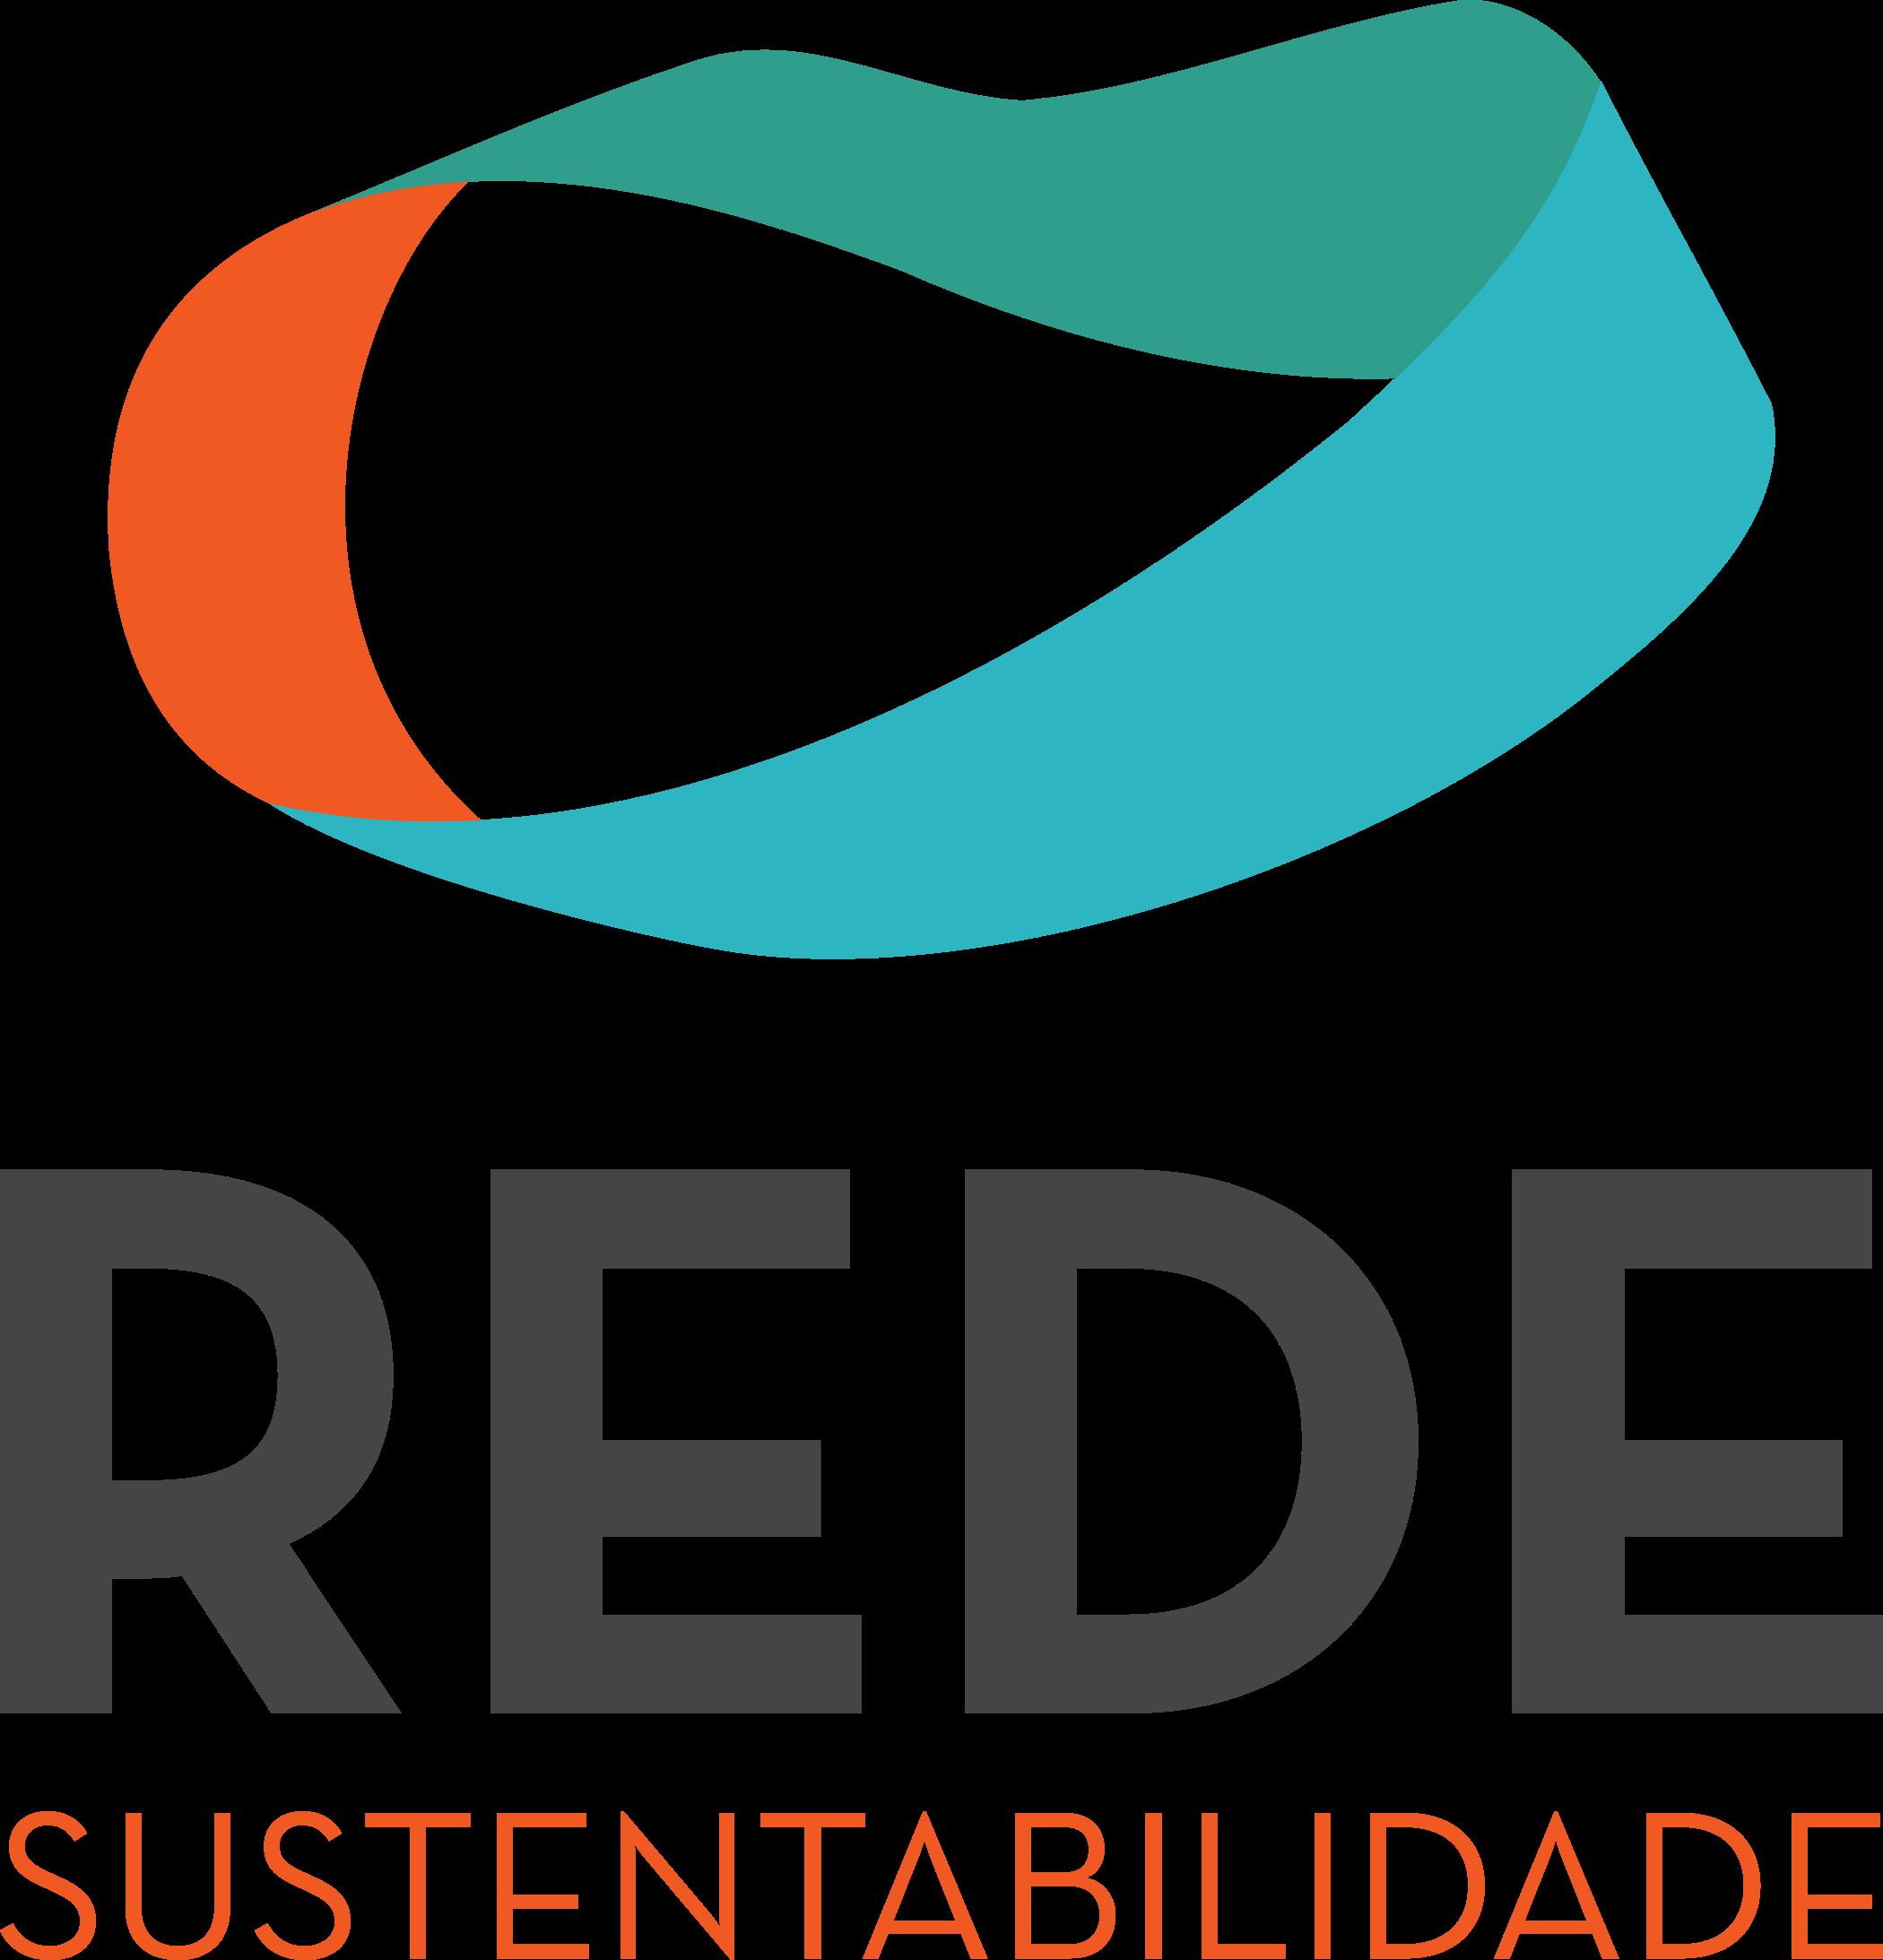 Rede Sustentabilidade Logo.